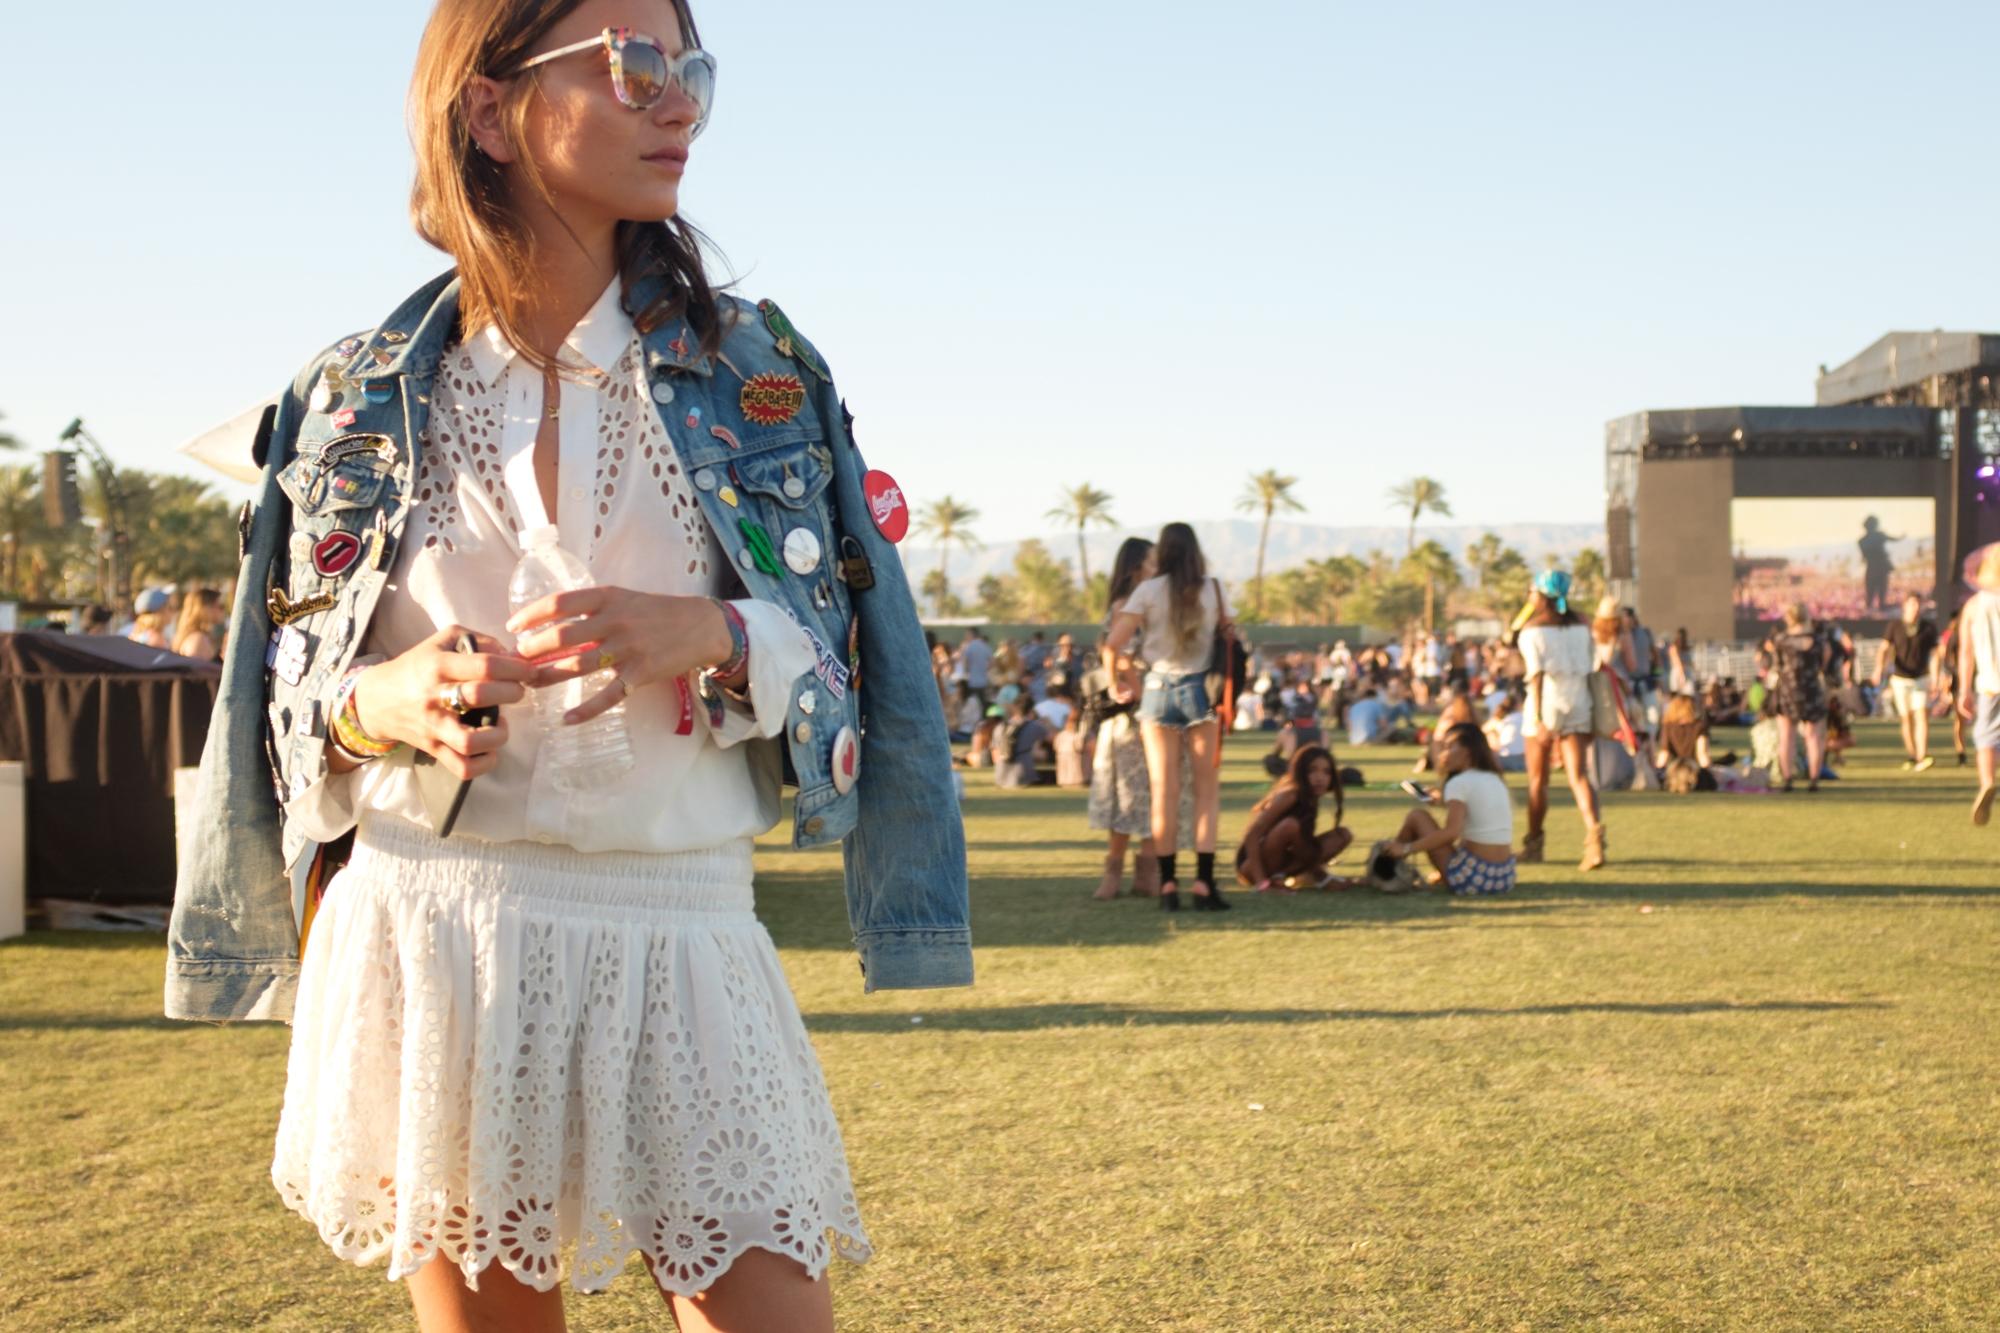 Spring Transitional Jackets - Cropped Denim Jacket at Coachella // NotJessFashion.com